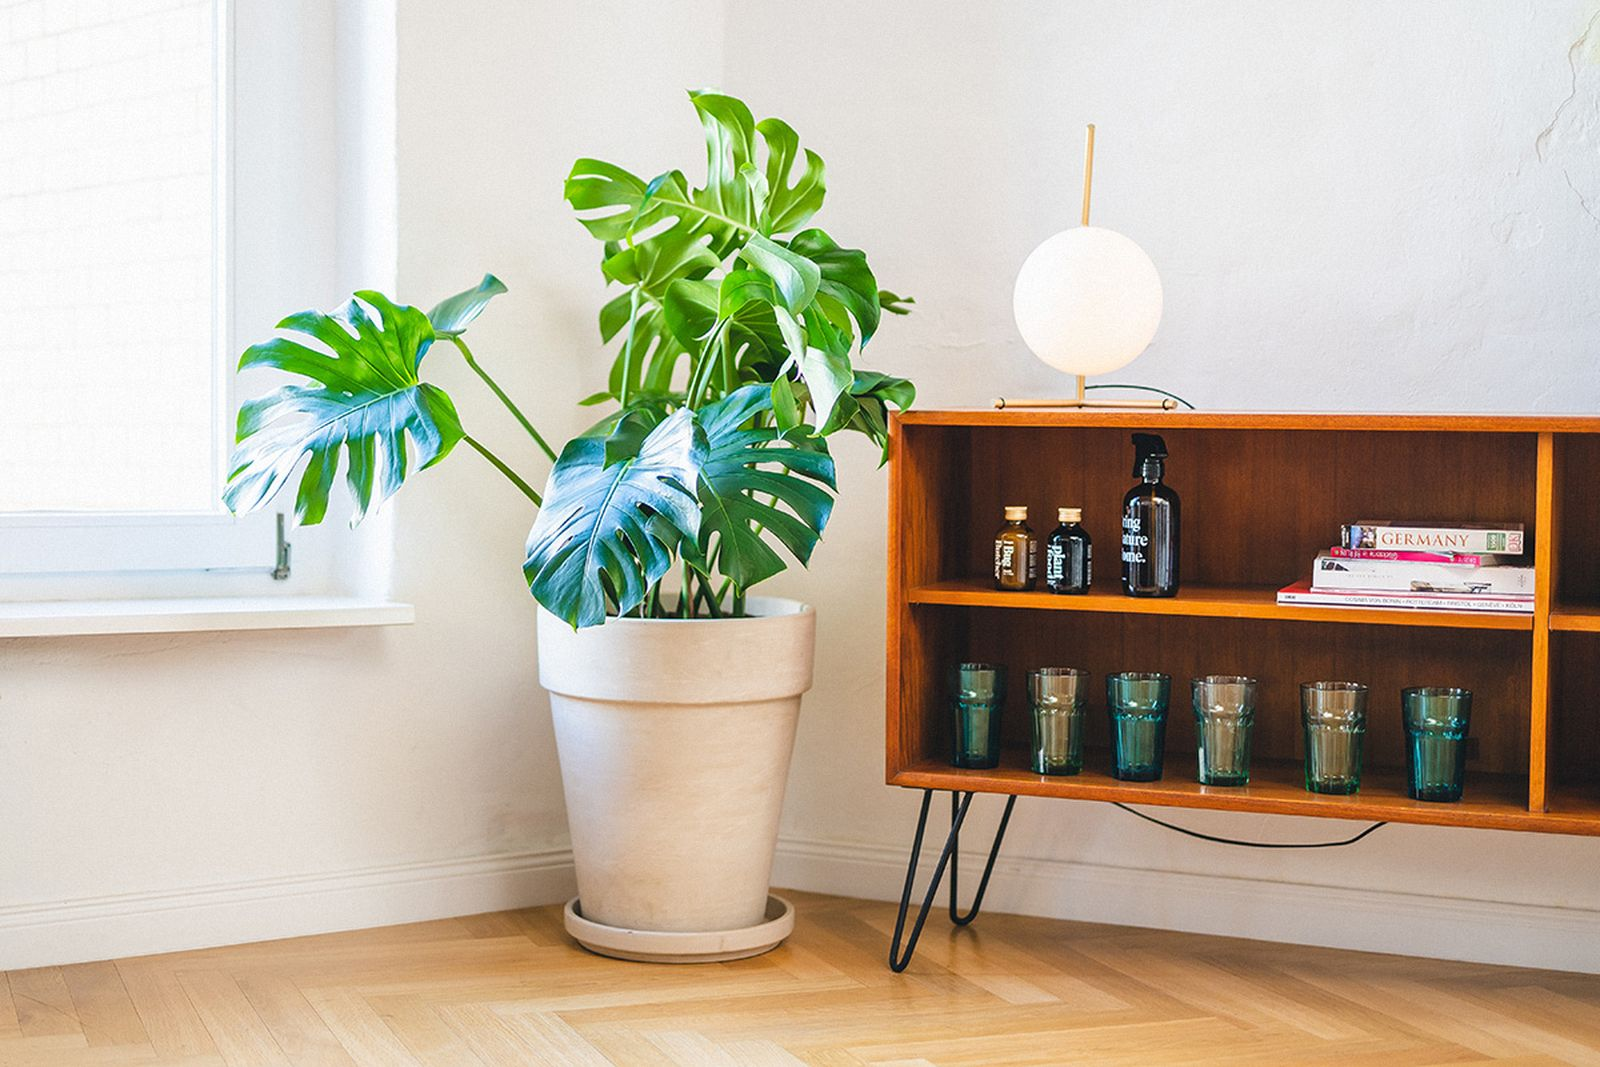 easy-house-plants-for-beginners-19